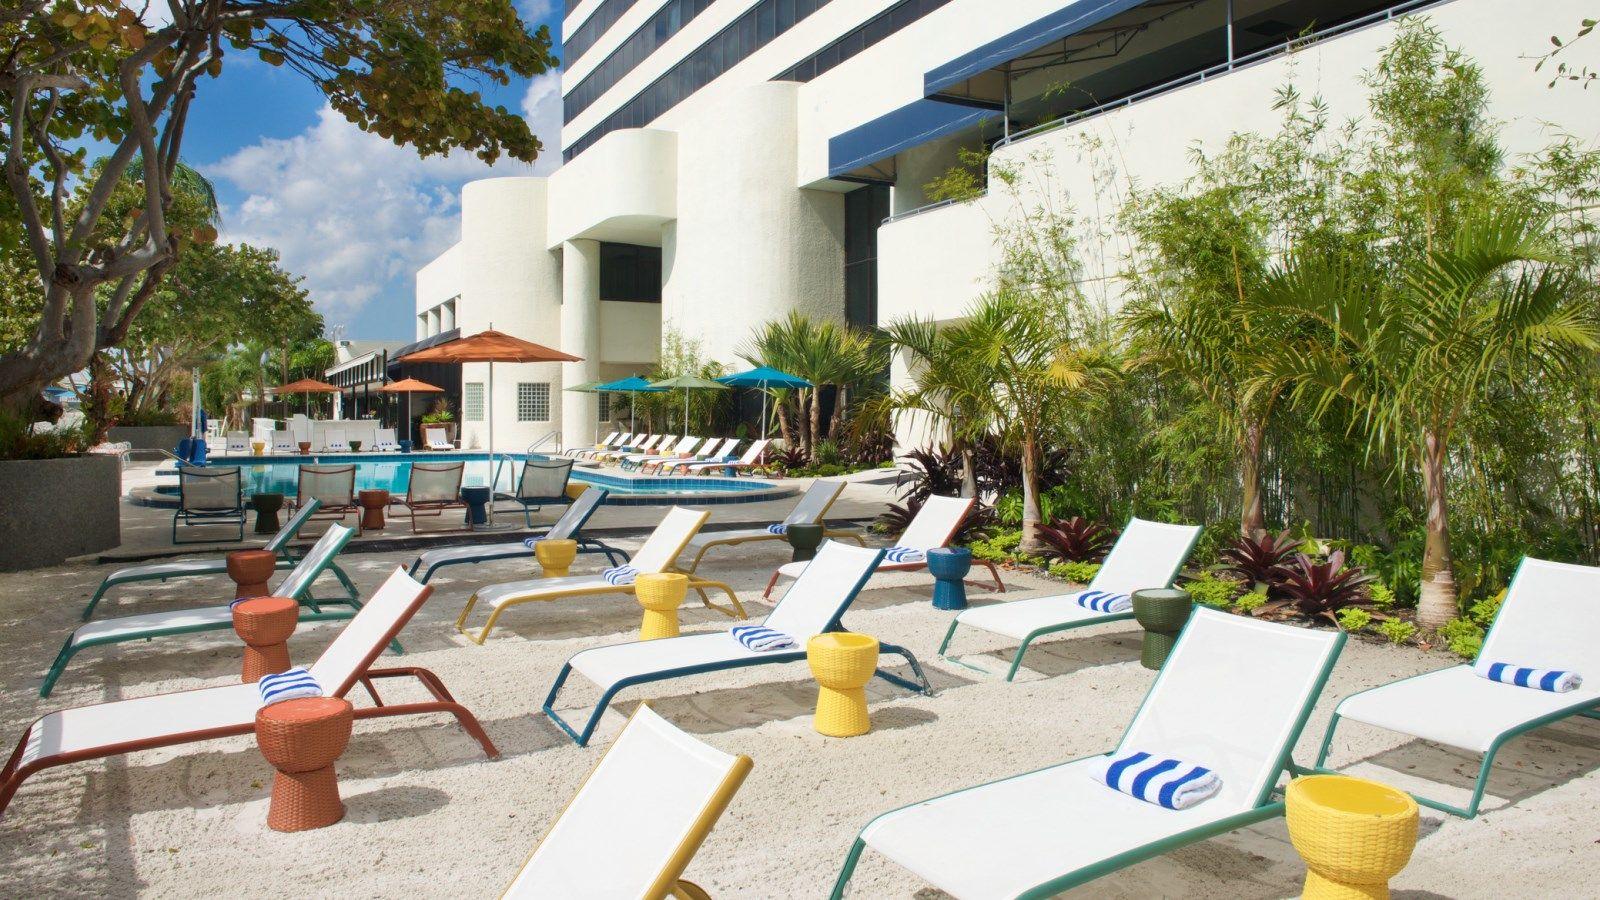 Sheraton Miami Airport Hotel & Executive Meeting Center image 9